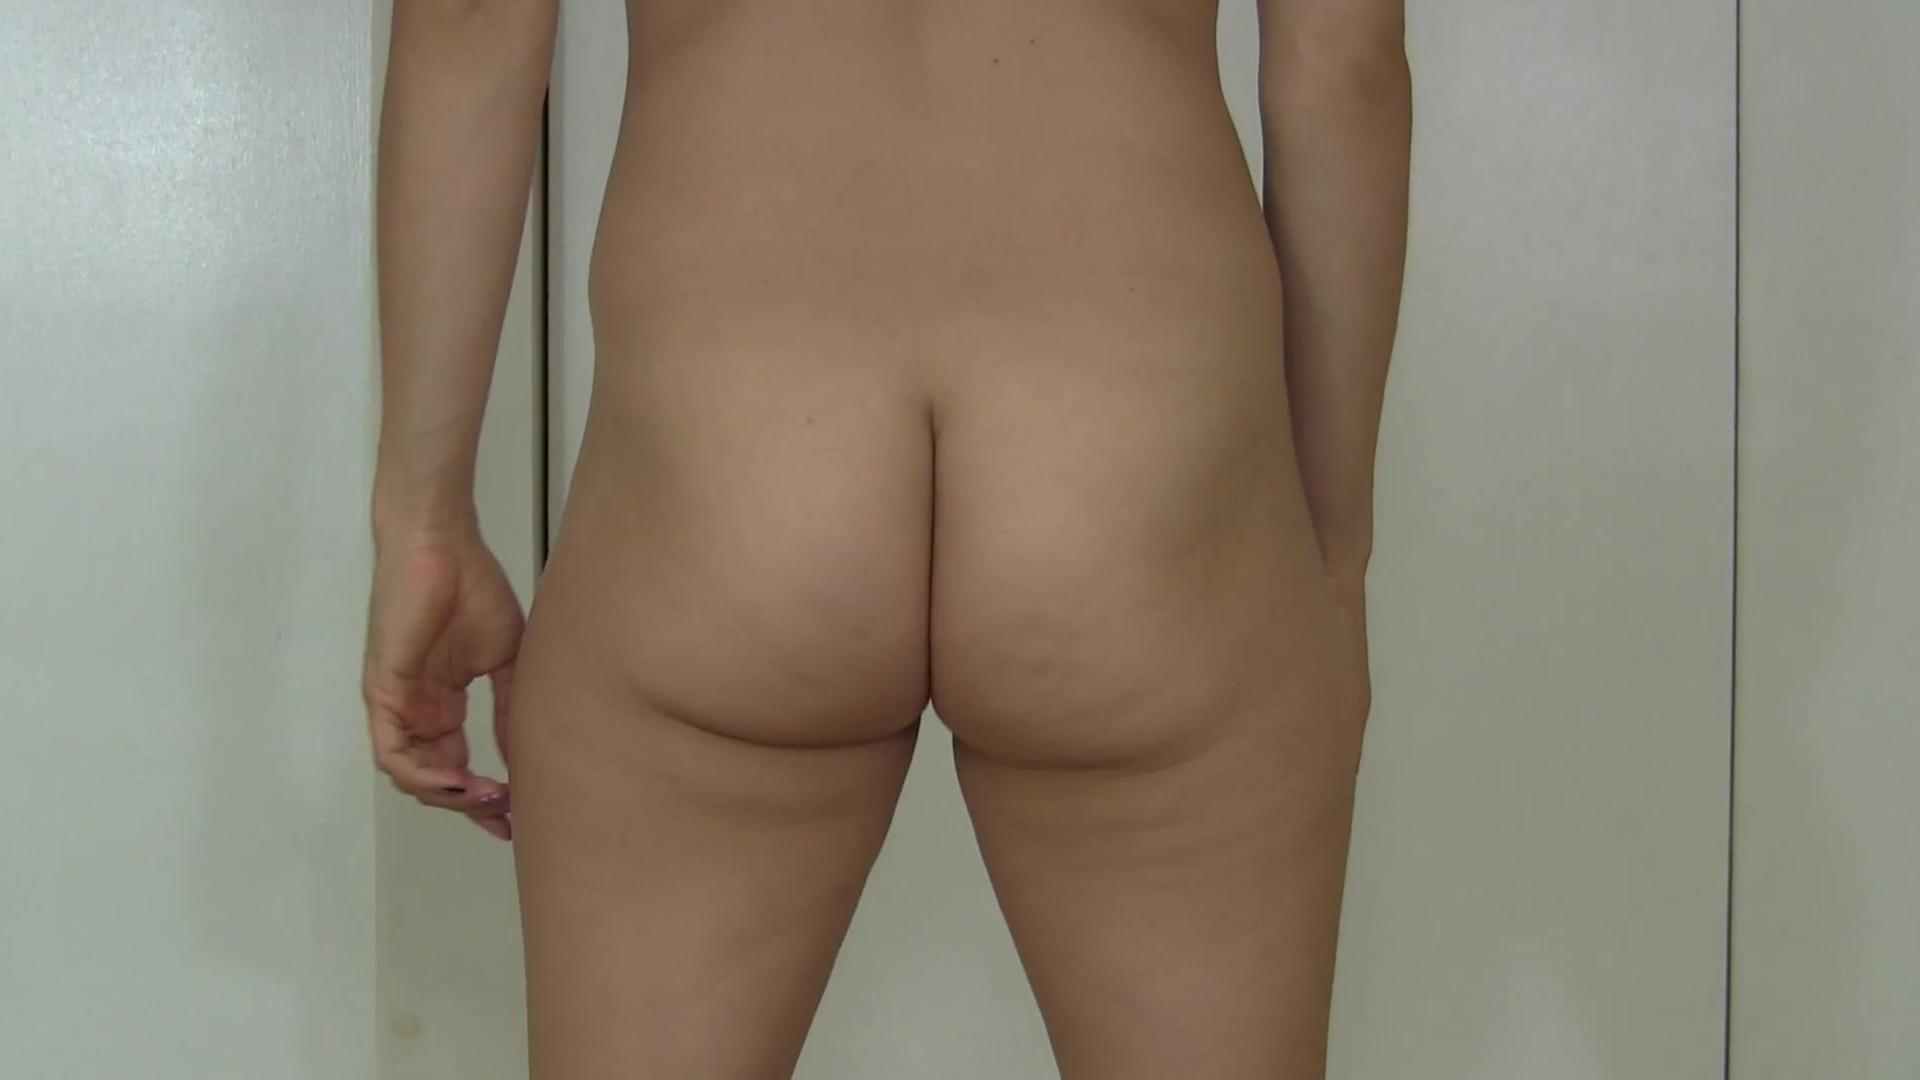 xxxindiangirls nude big boobs n pussy photos